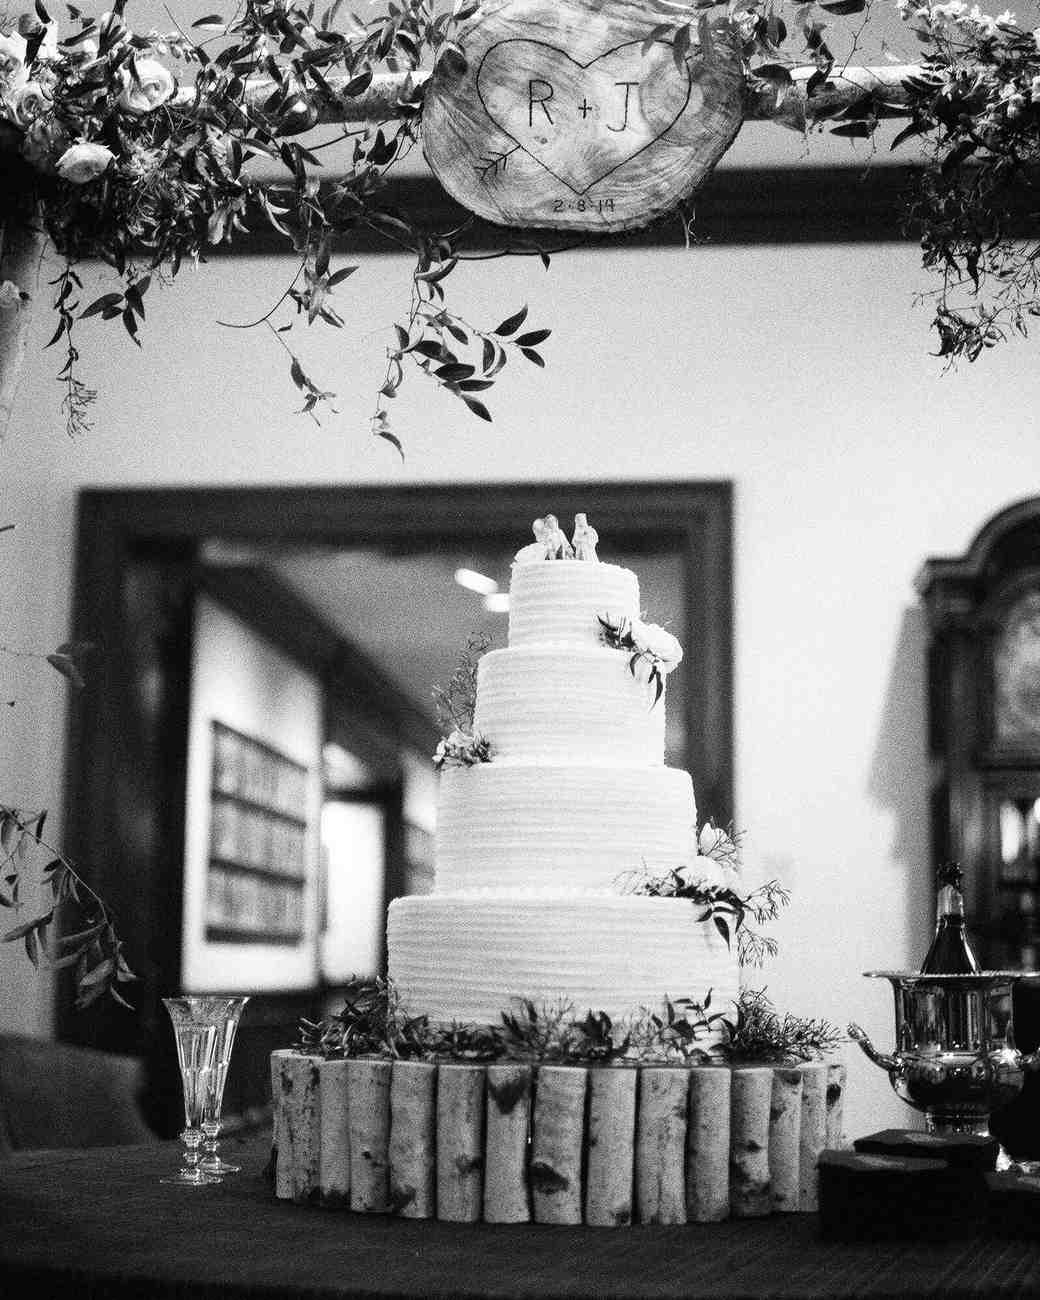 jane-ryan-wedding-cake2-171-s111352-0714.jpg